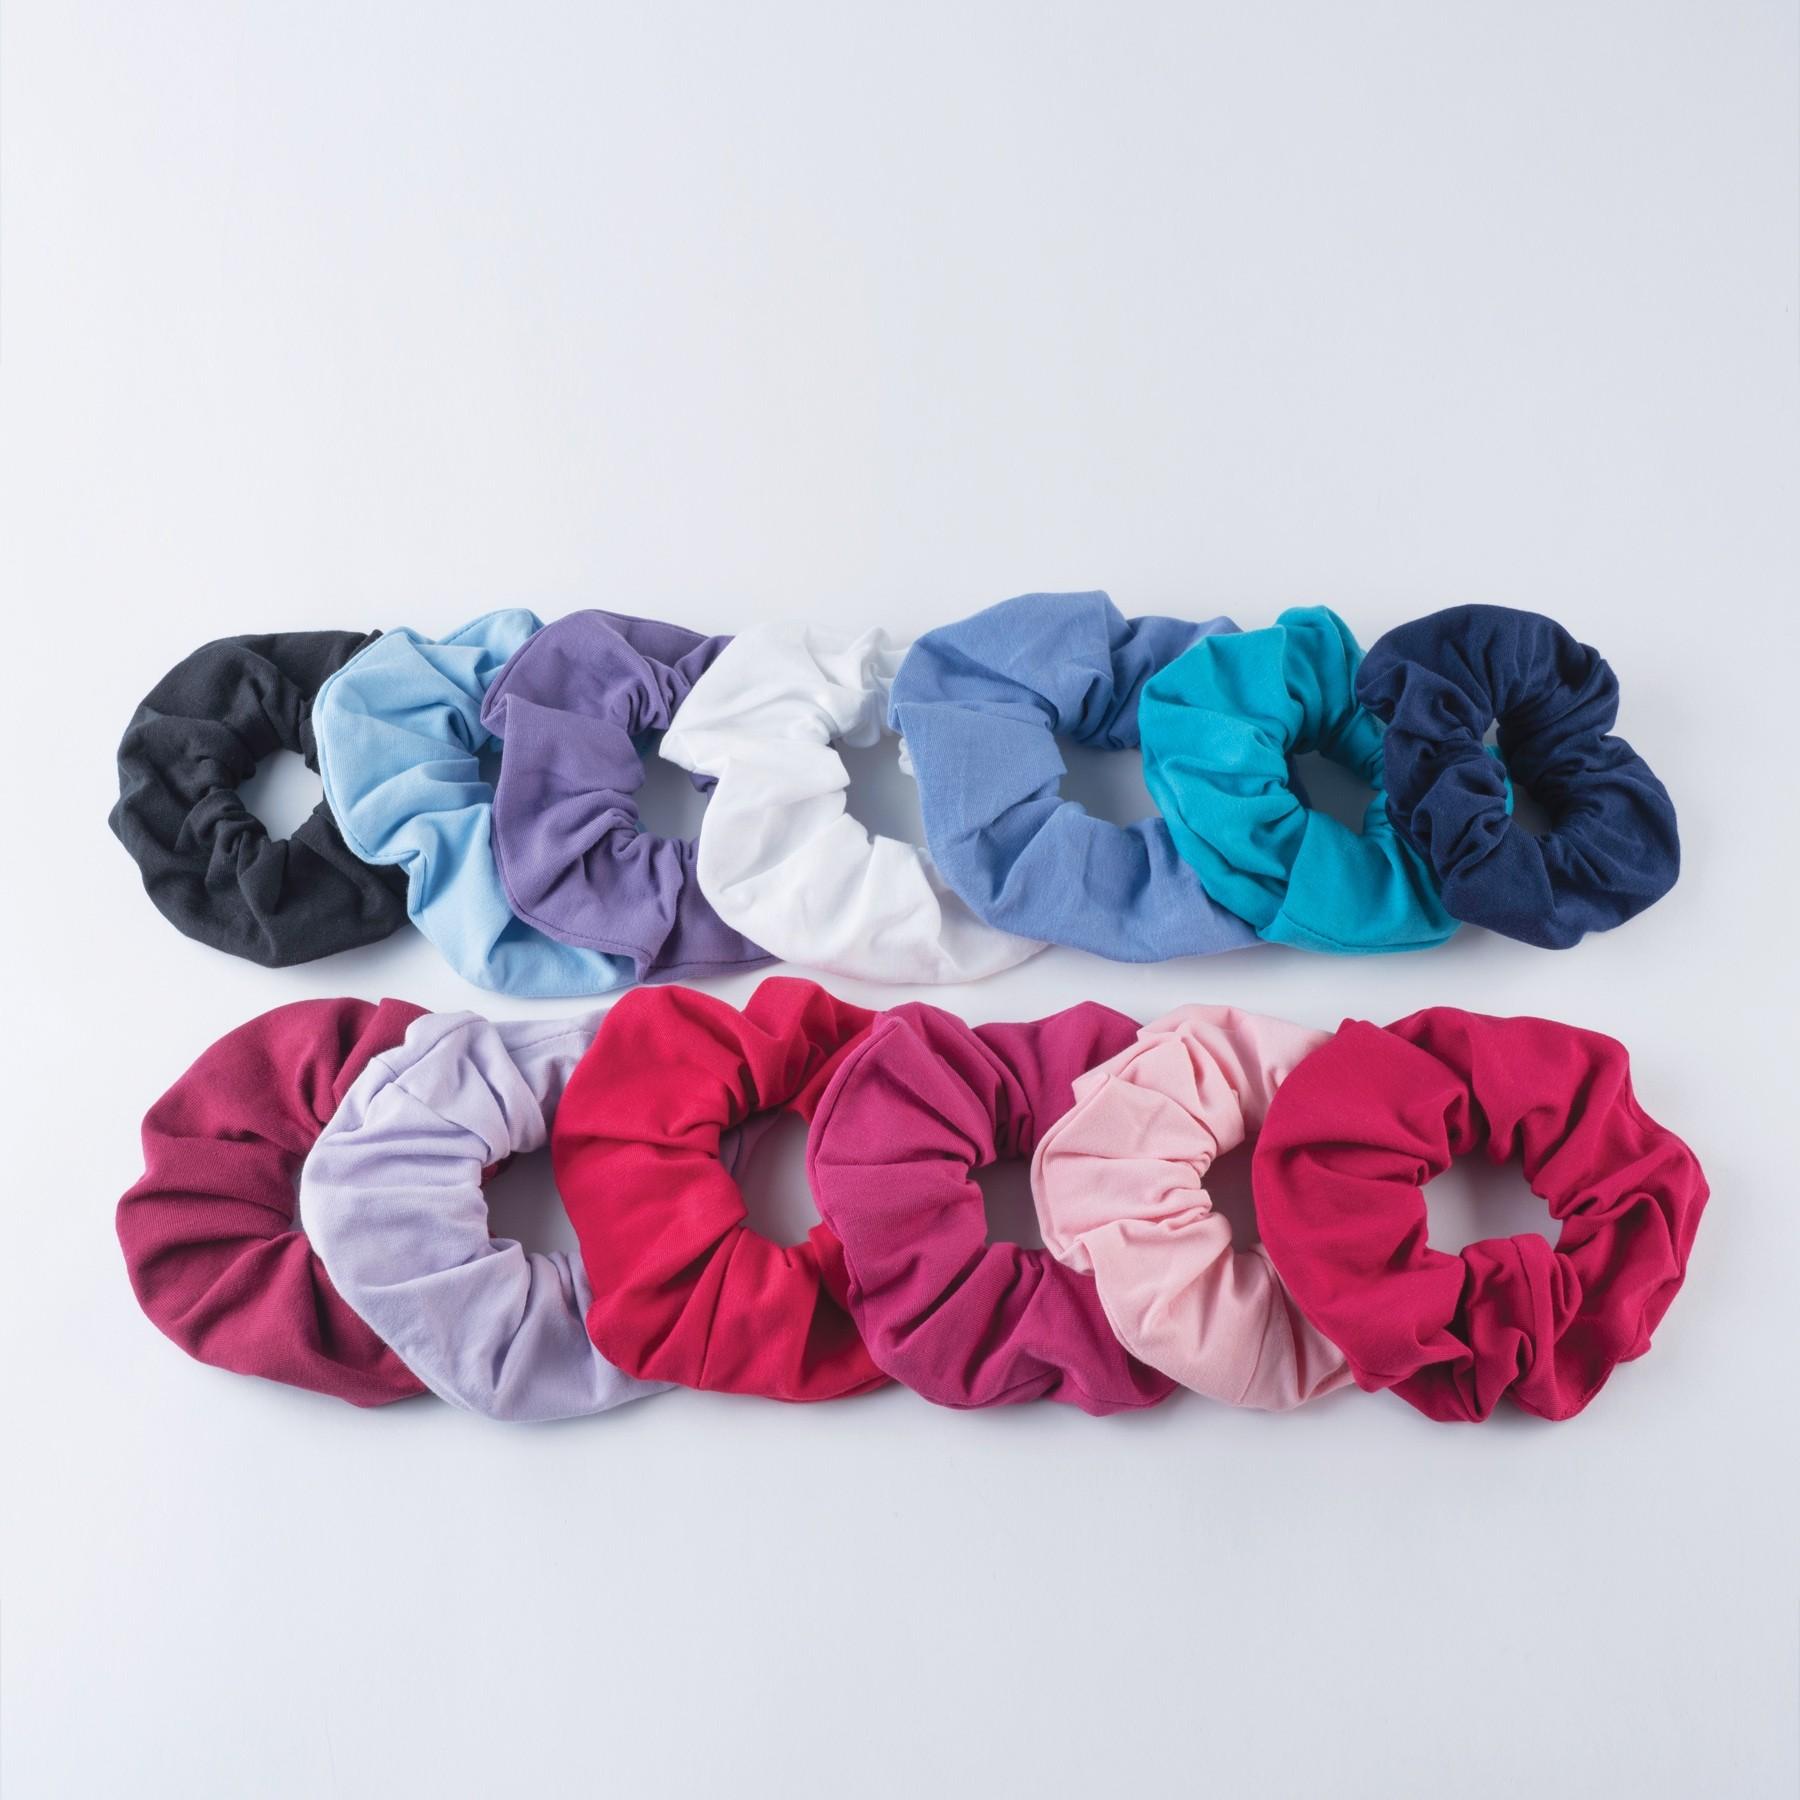 1st Position Single Scrunchie (Cotton/Elastane) Black